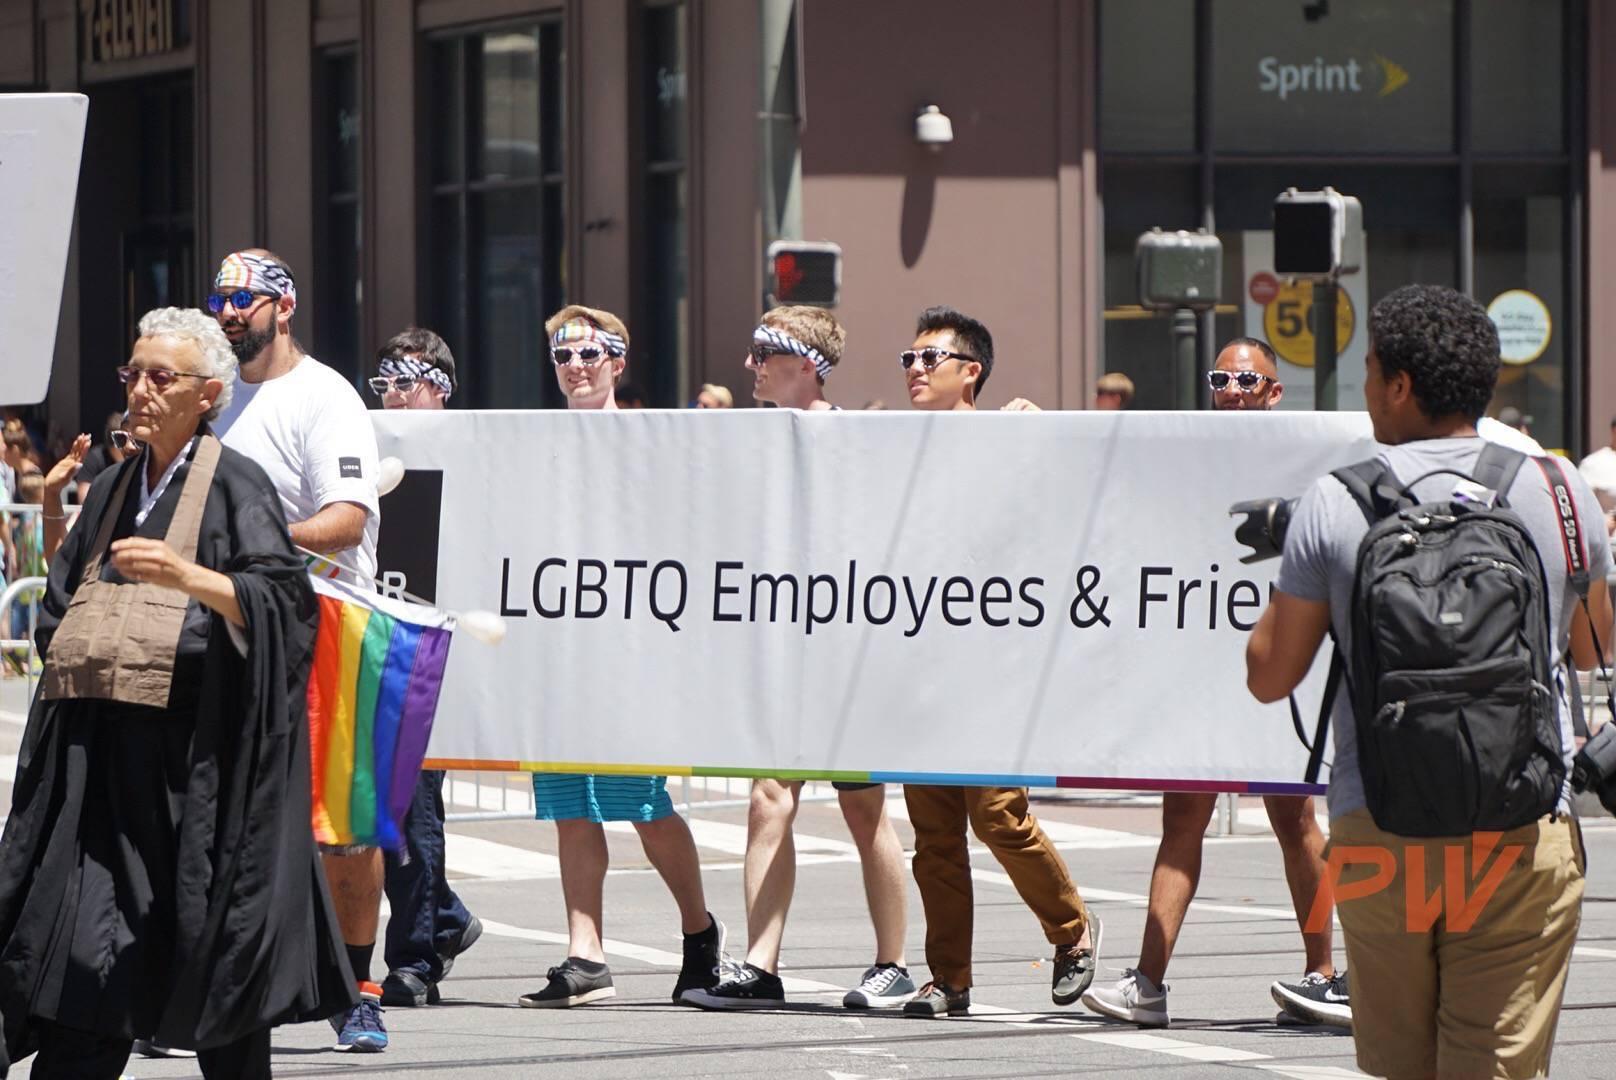 uber-pride